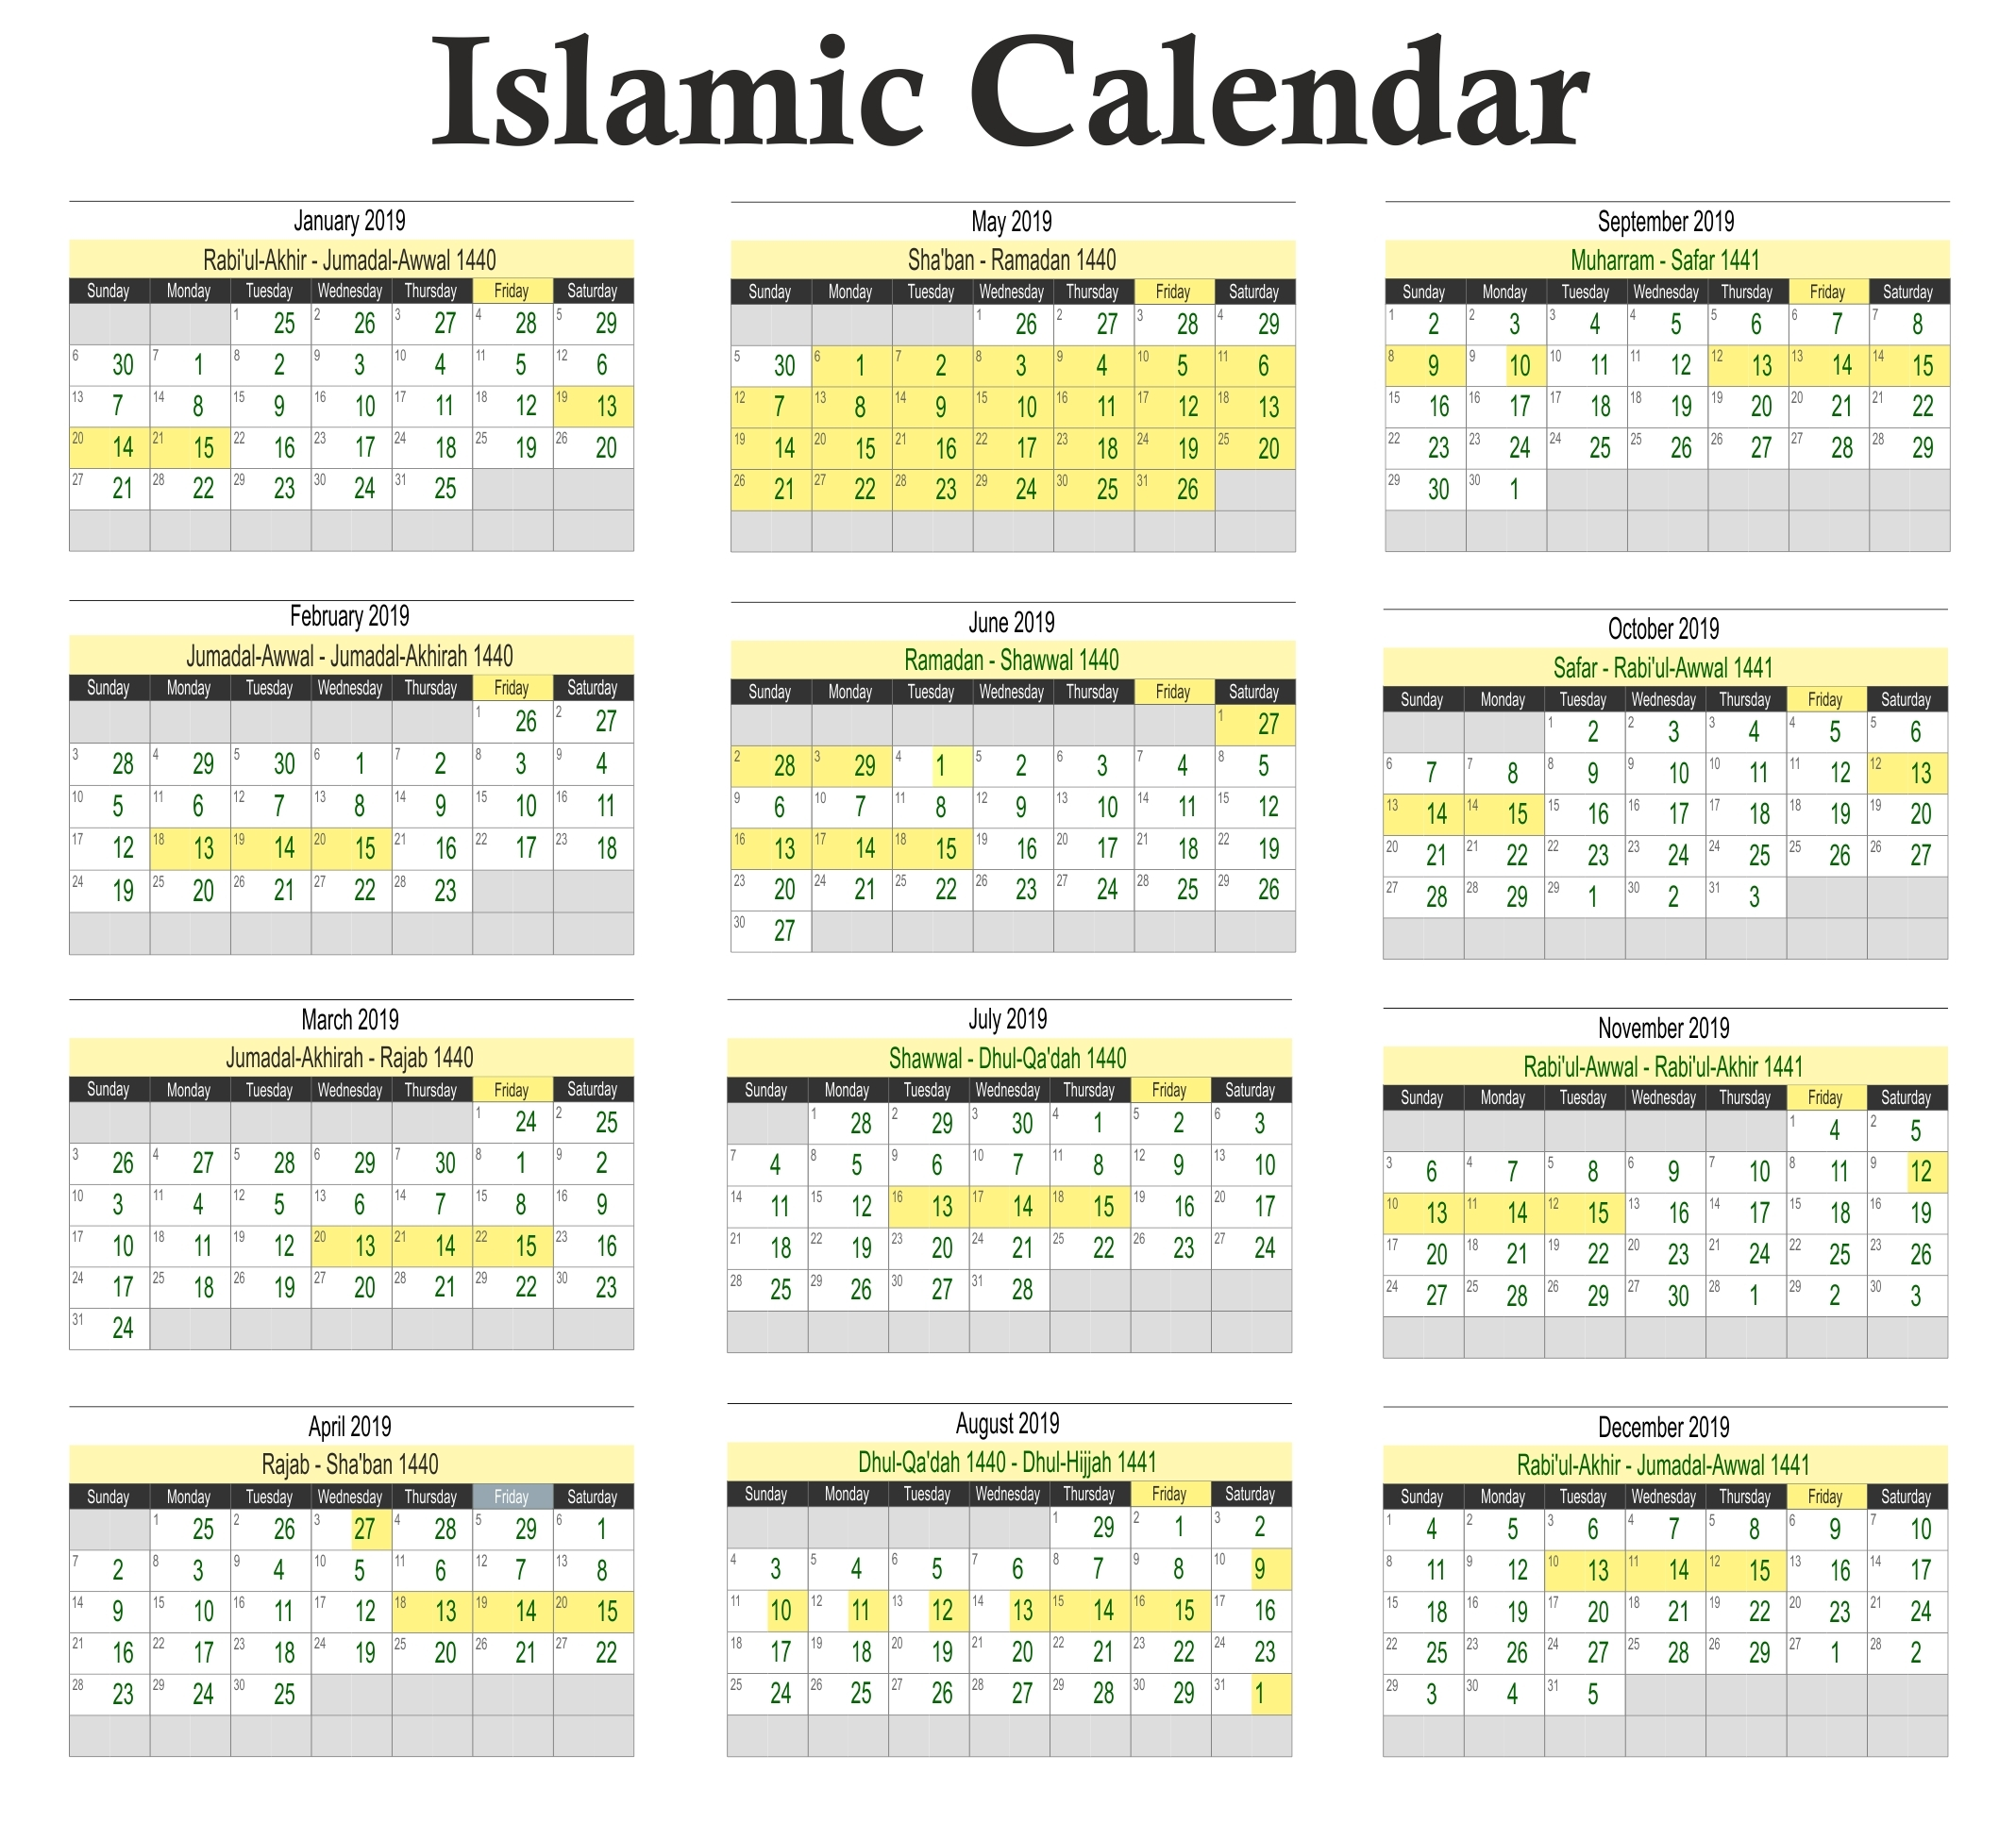 Hijri Calendar 2020 | Exam Calendar  Shia Islamic Hijri Calendar 2020